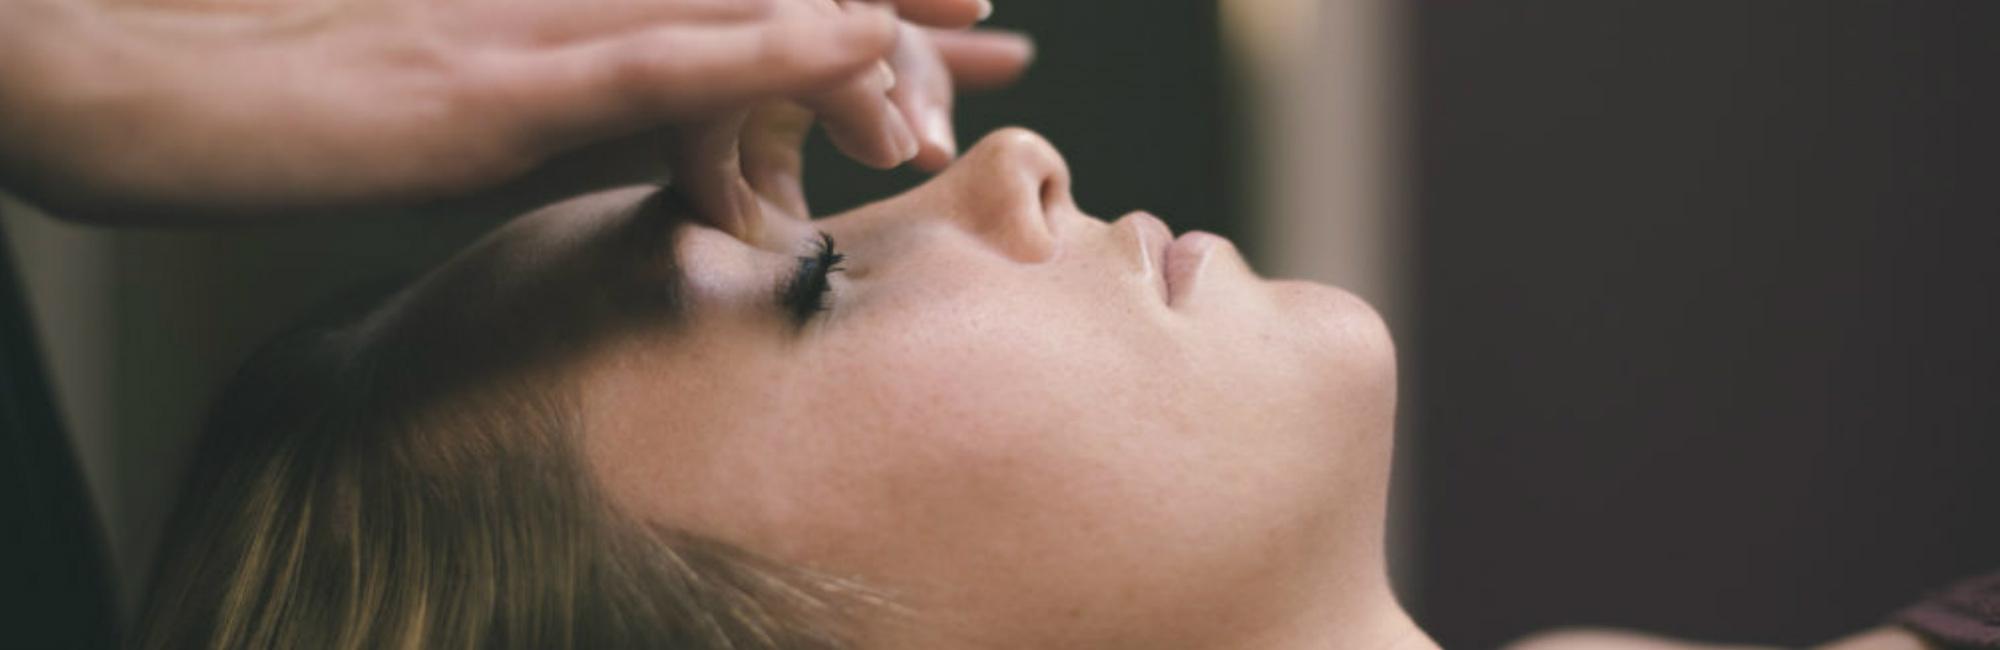 Cancer Touch Therapy - Cancer Touch Therapy